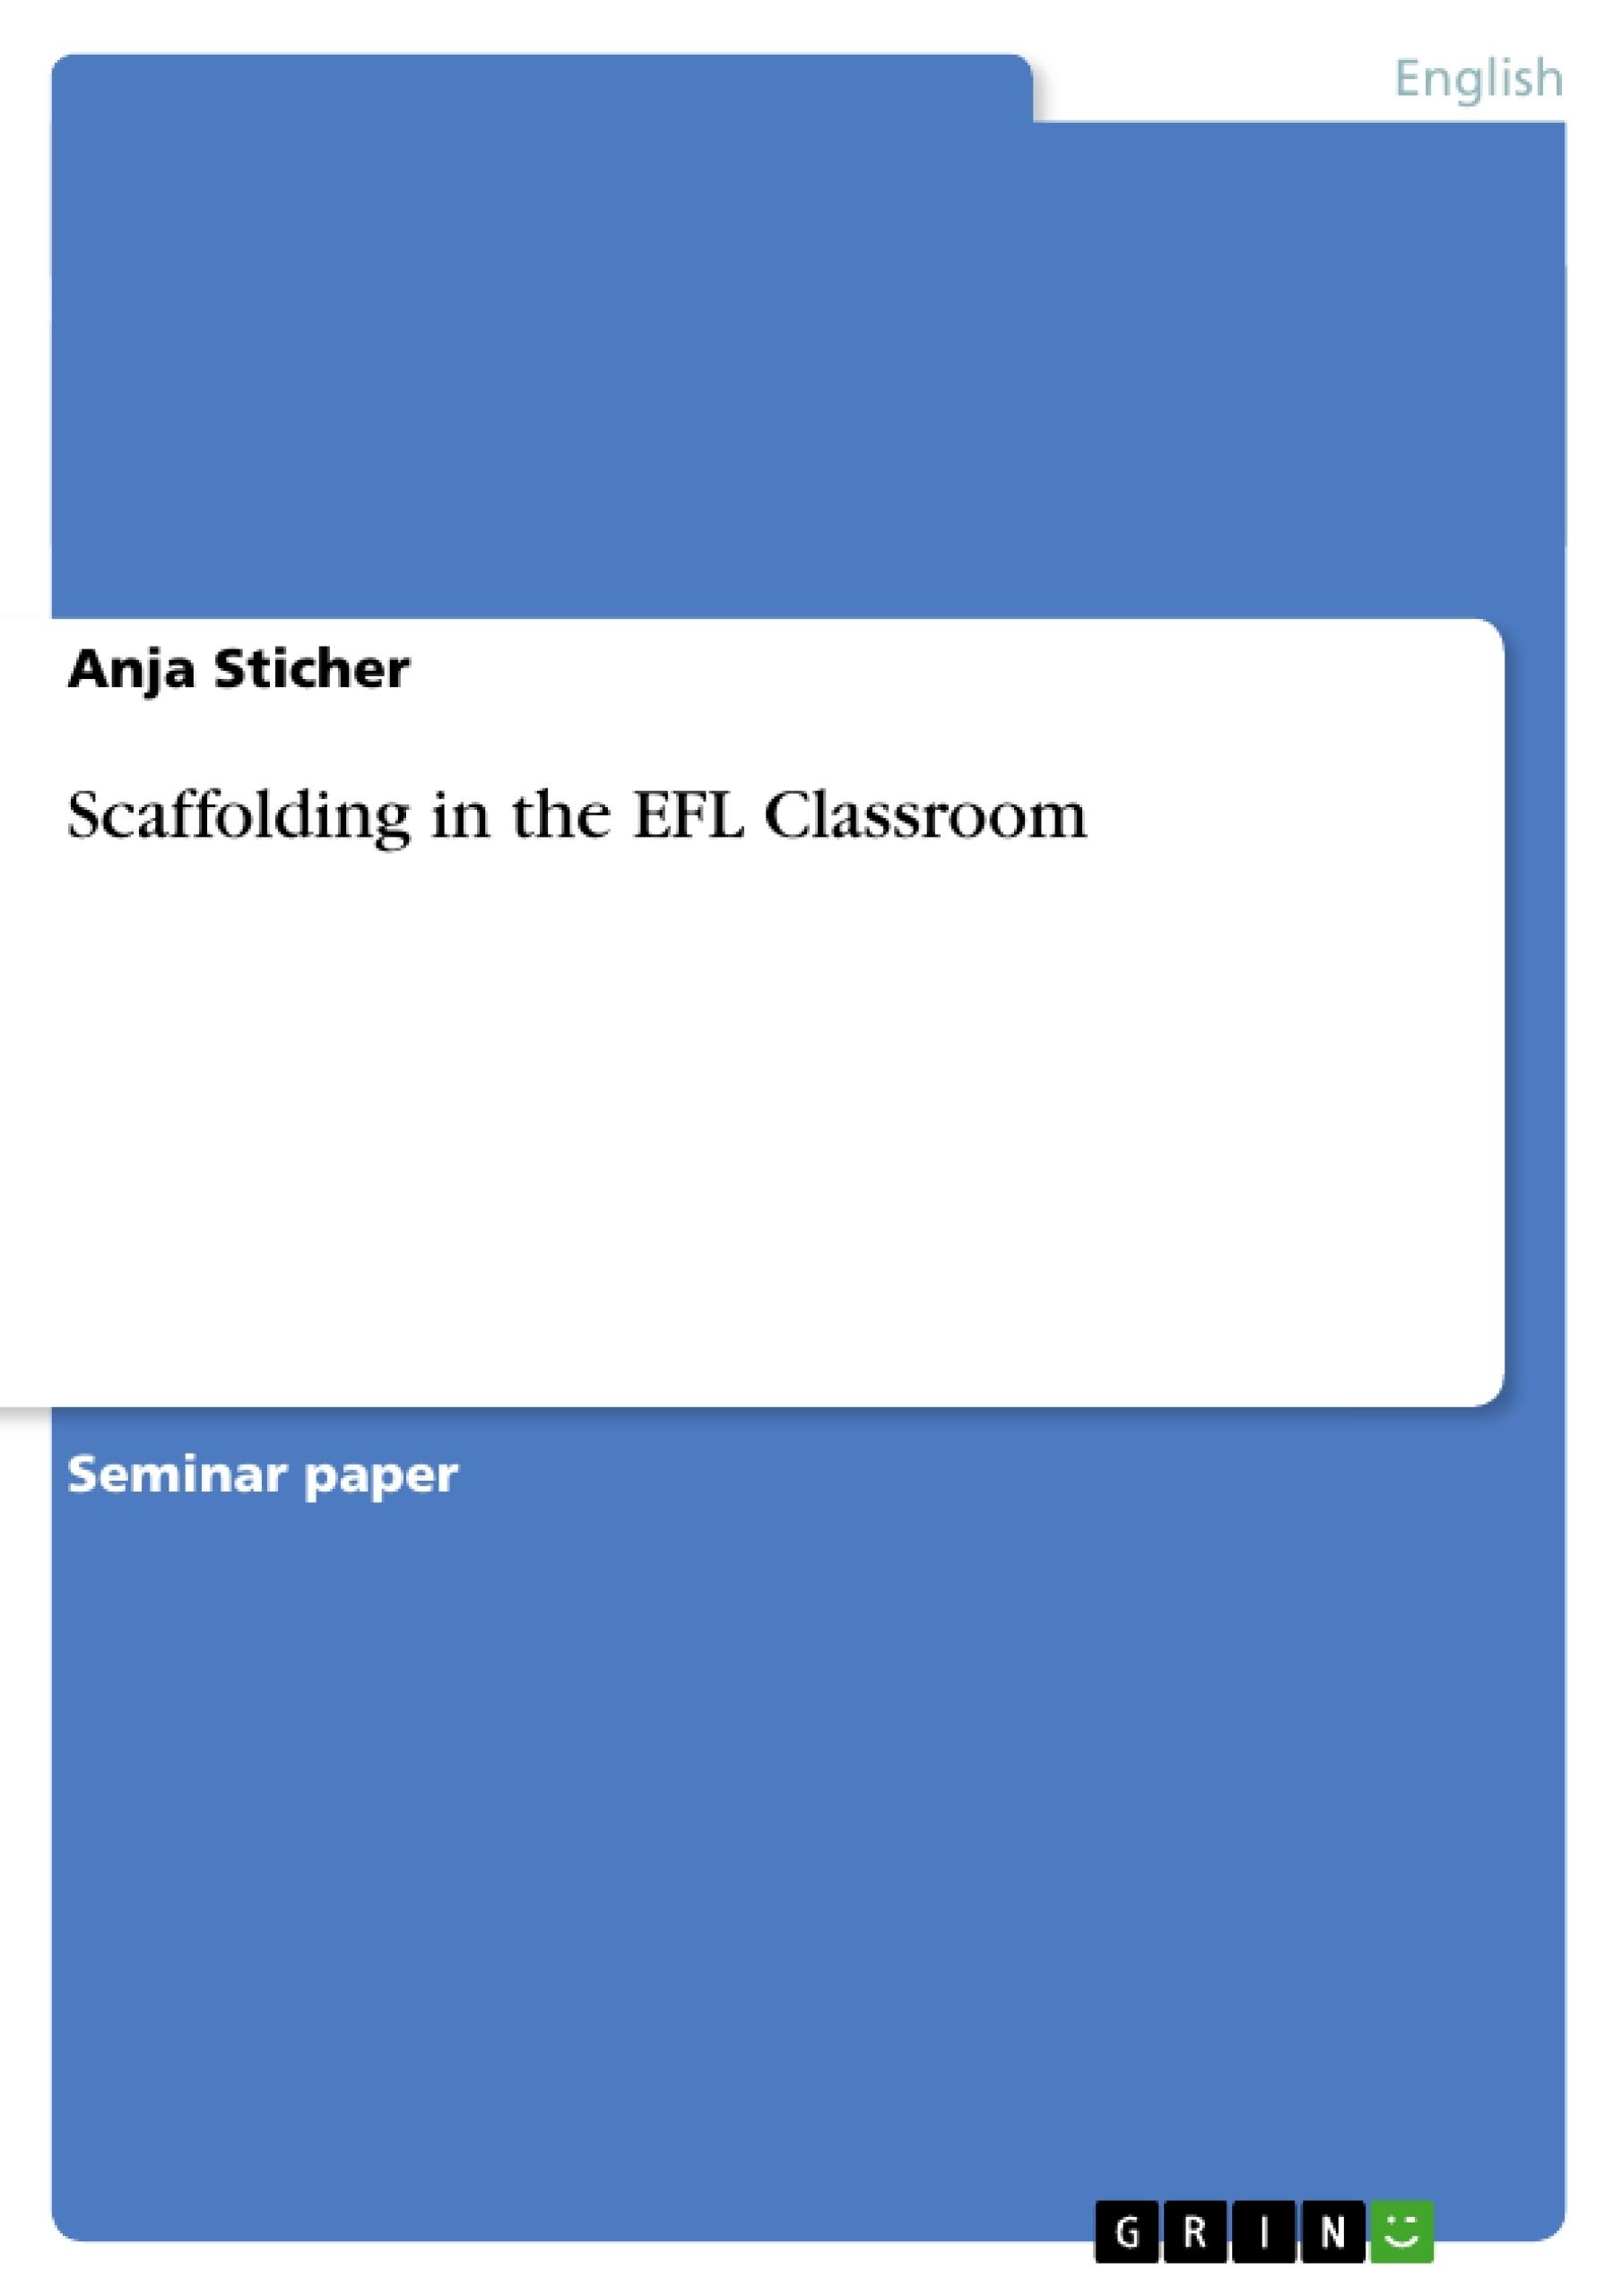 Title: Scaffolding in the EFL Classroom